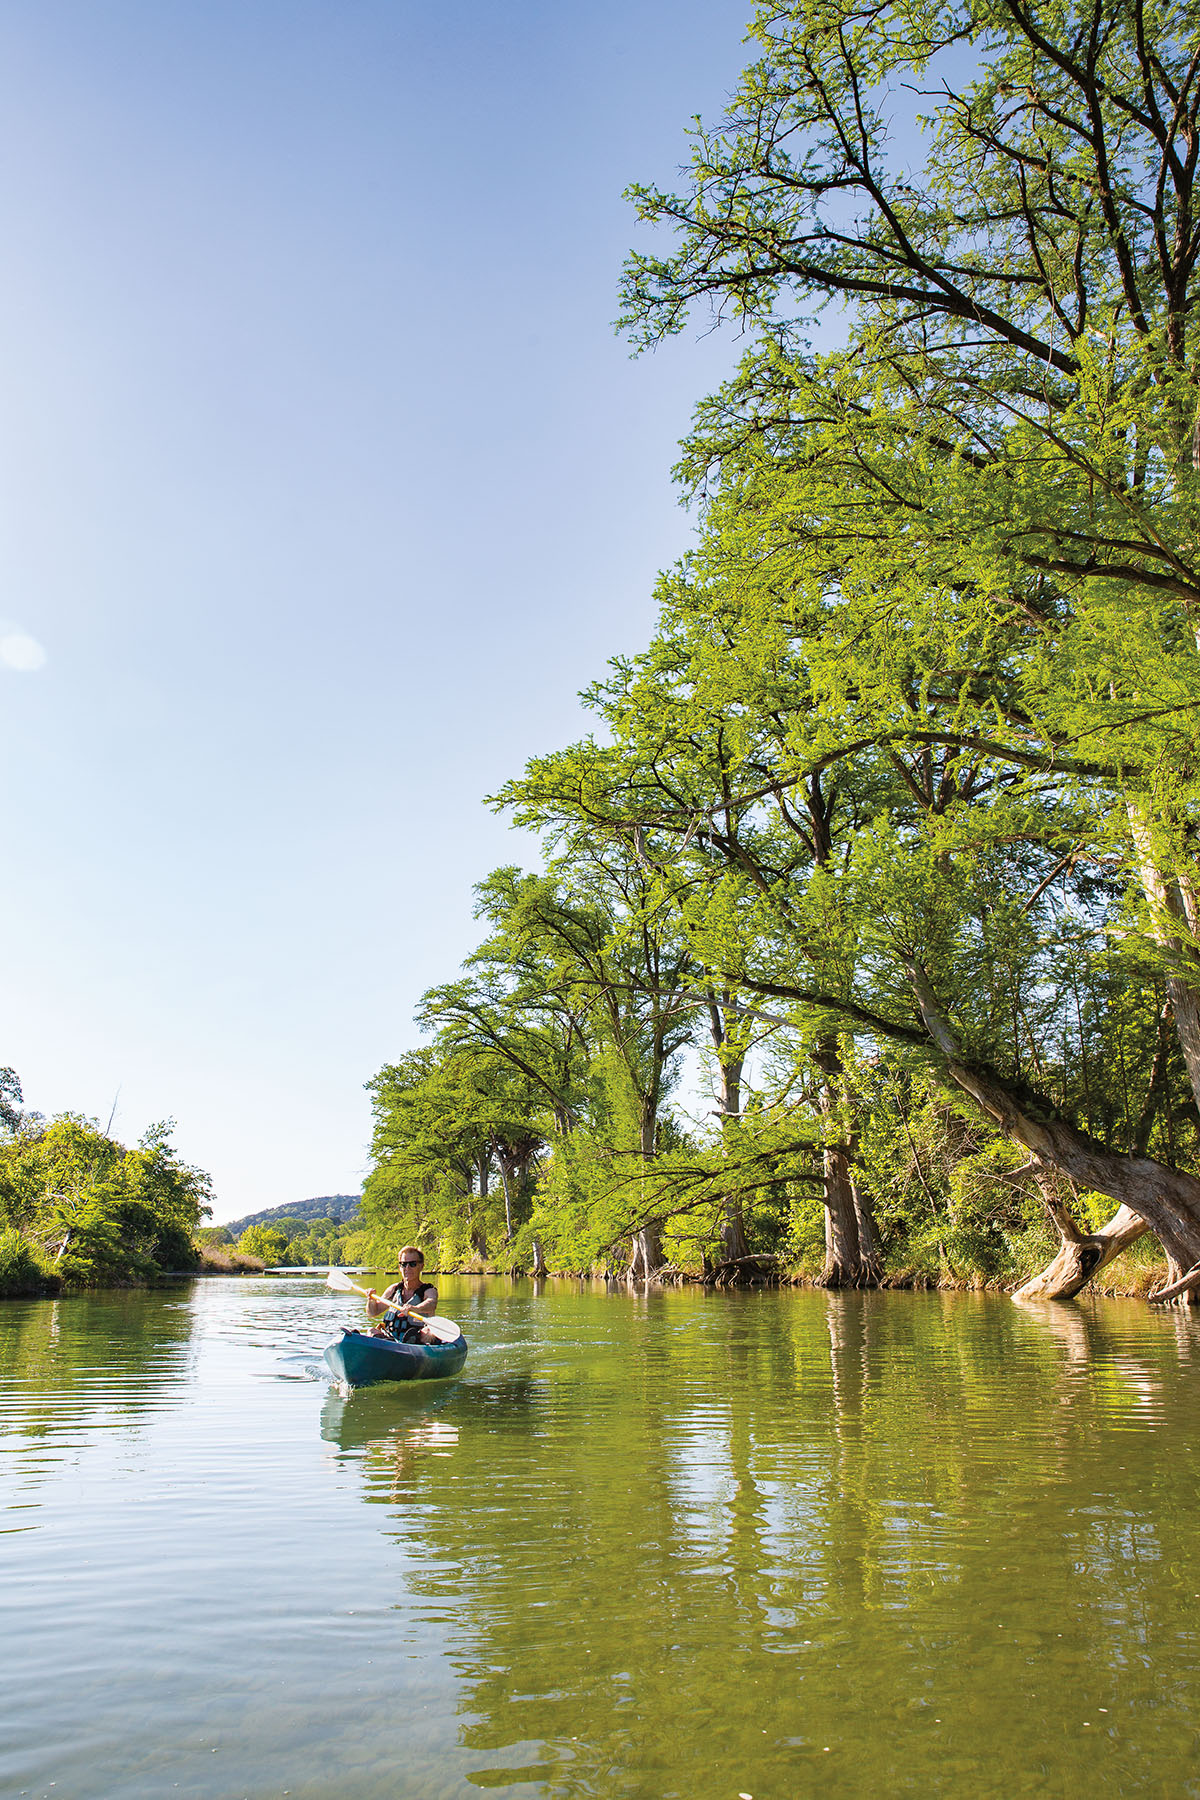 WIMBERLEY, TX - MAY 6, 2021 - Author Joe Nick Patoski Paddles The Blanco River Near His Home.